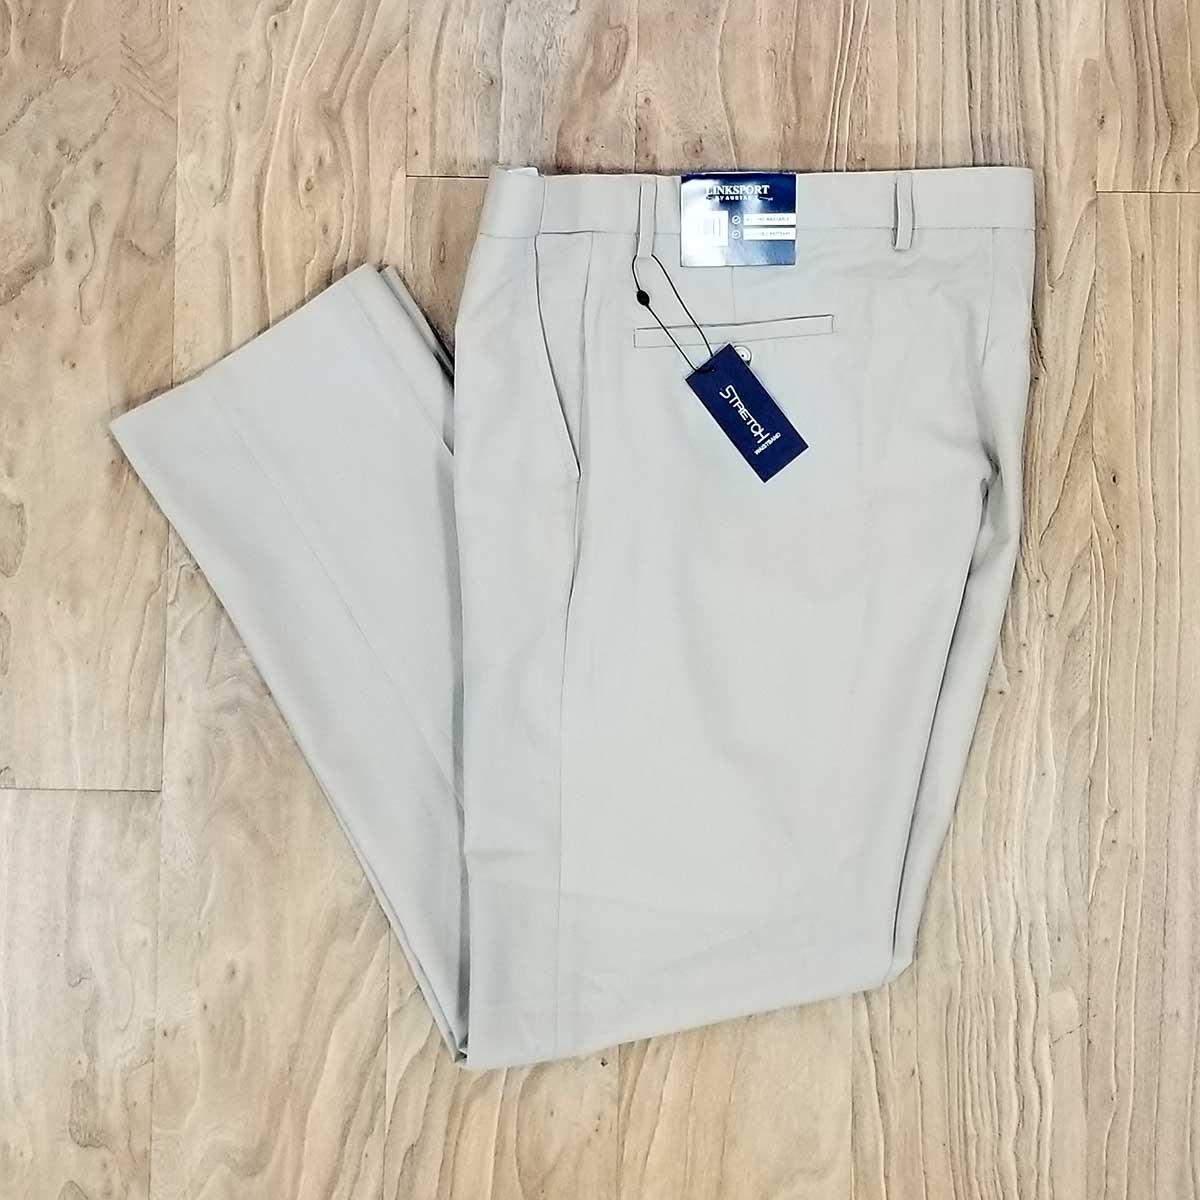 Linksport Premium Golf Pant - Khaki